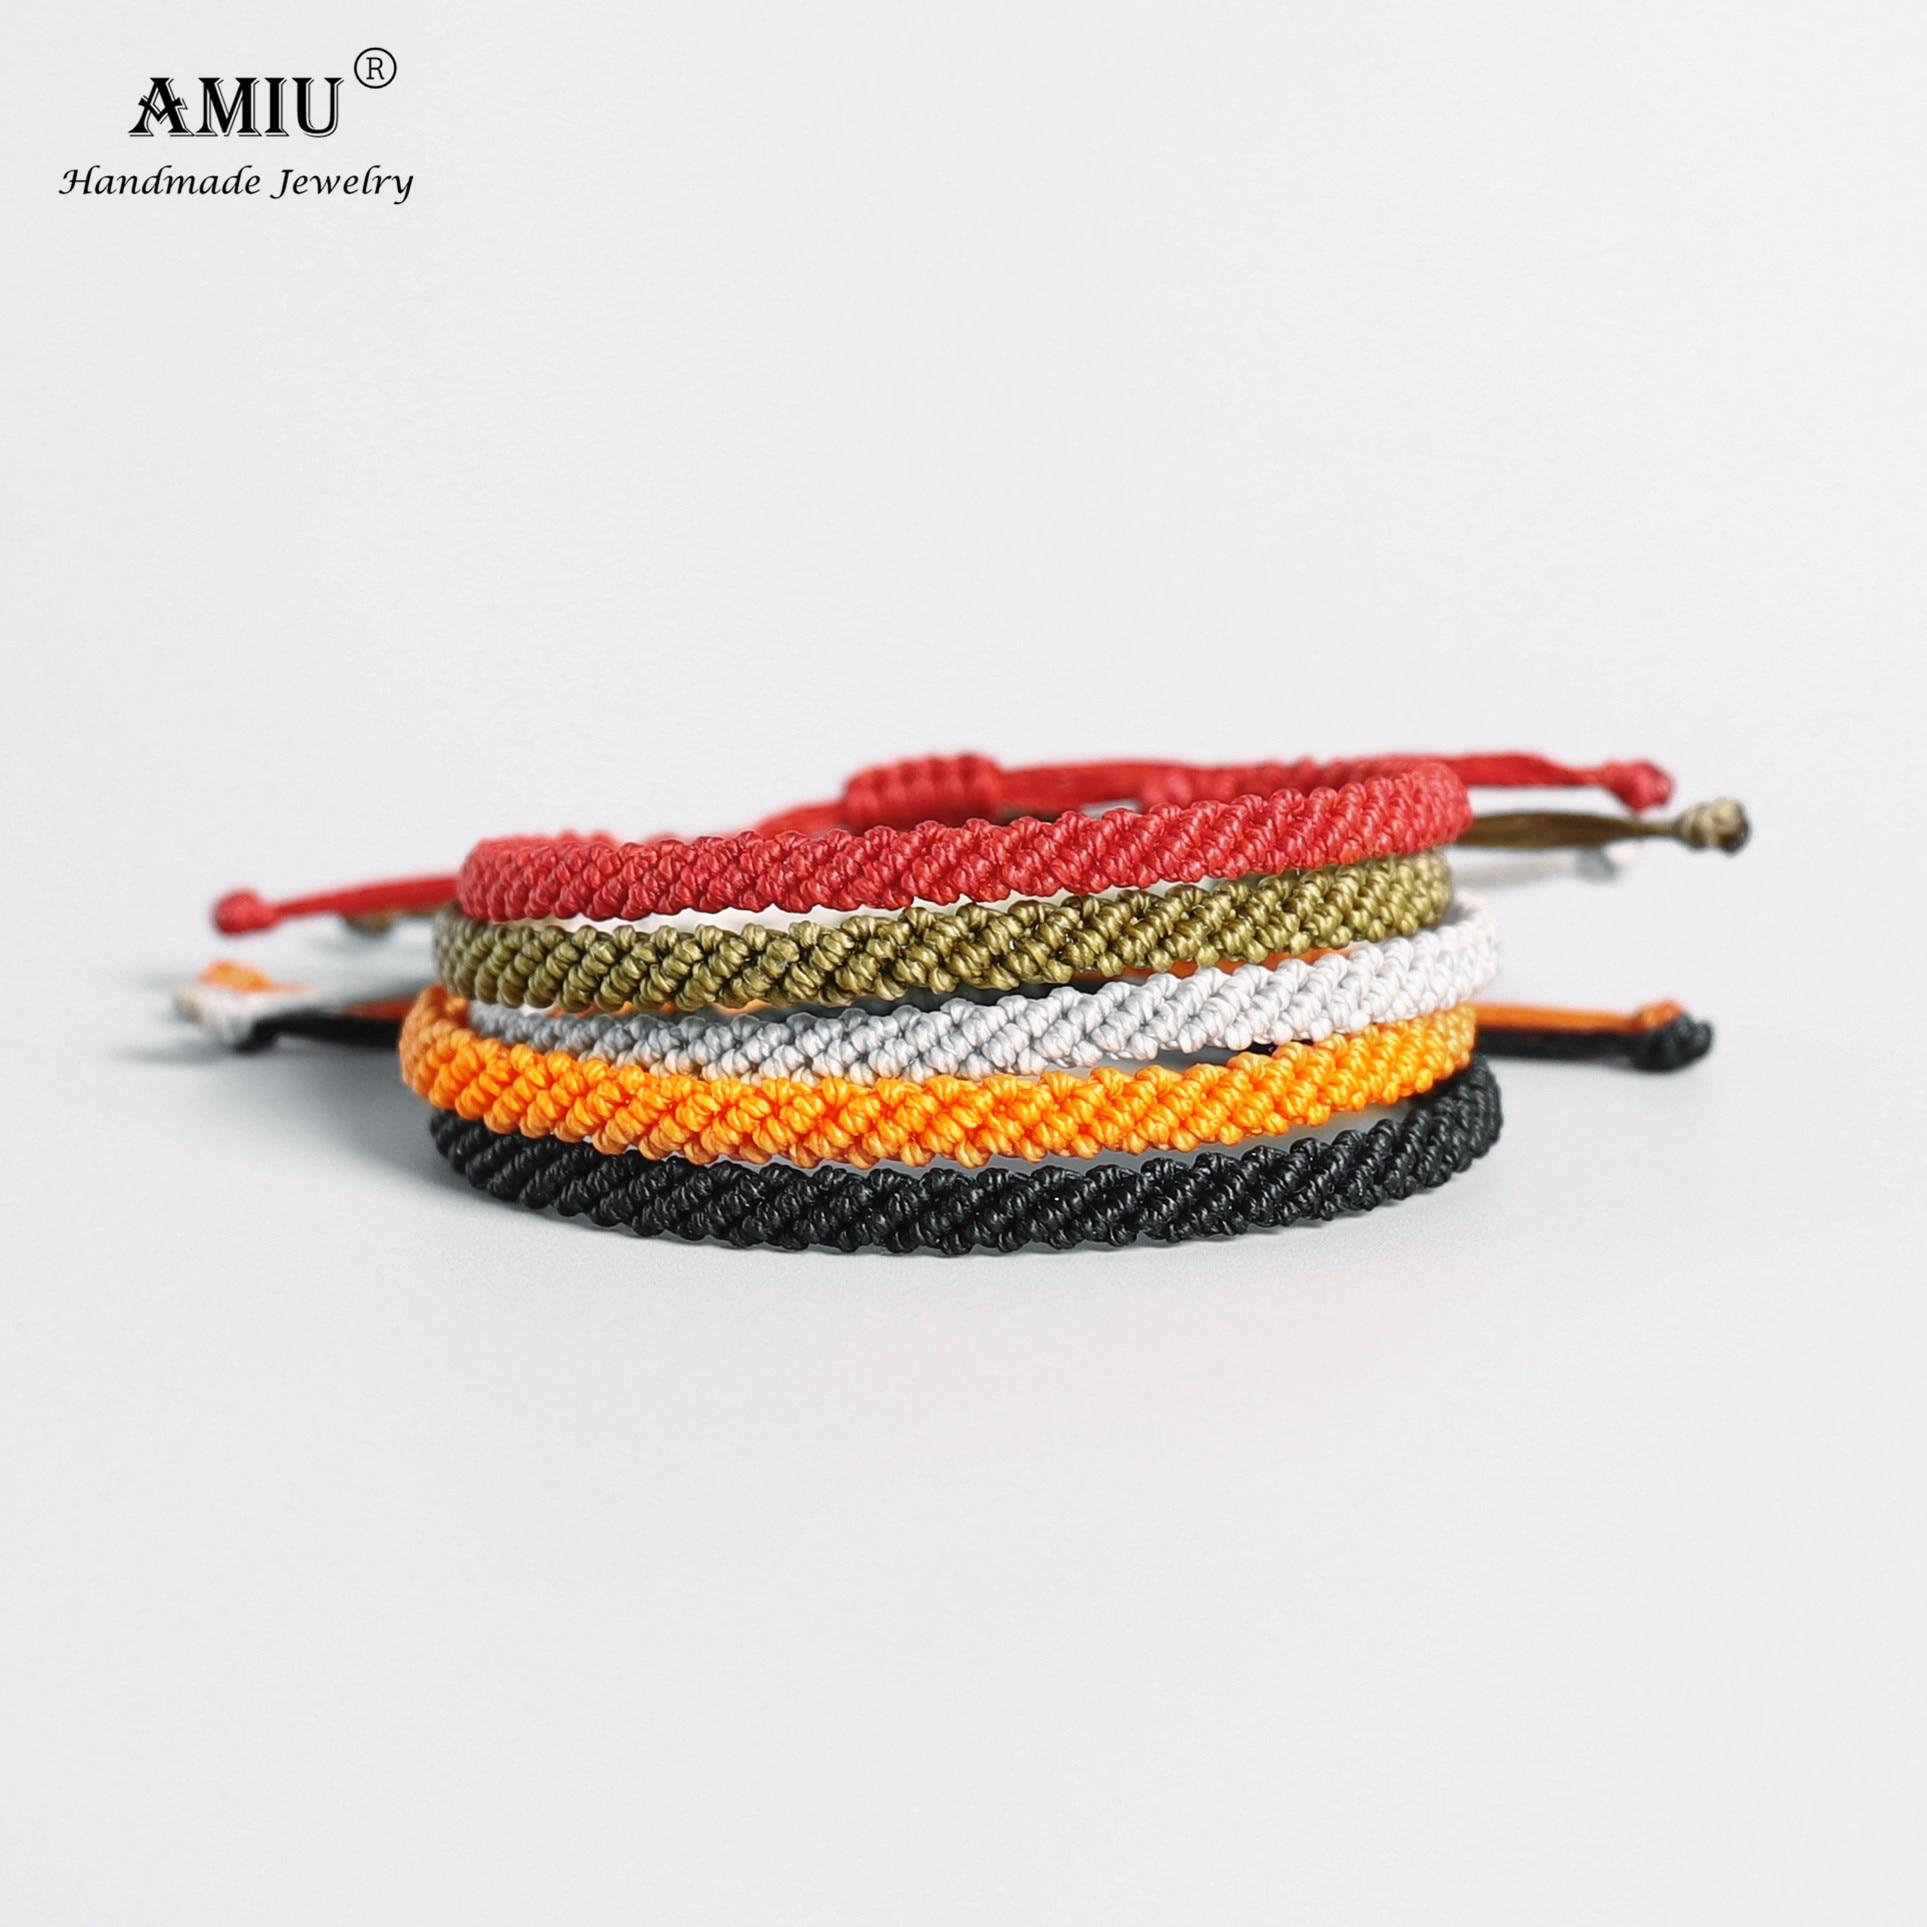 AMIU Handmade Waterproof Wax Thread Lucky Rope Bracelet & Bangles For Women Men Wax Thread Macrame Bracelets(China)